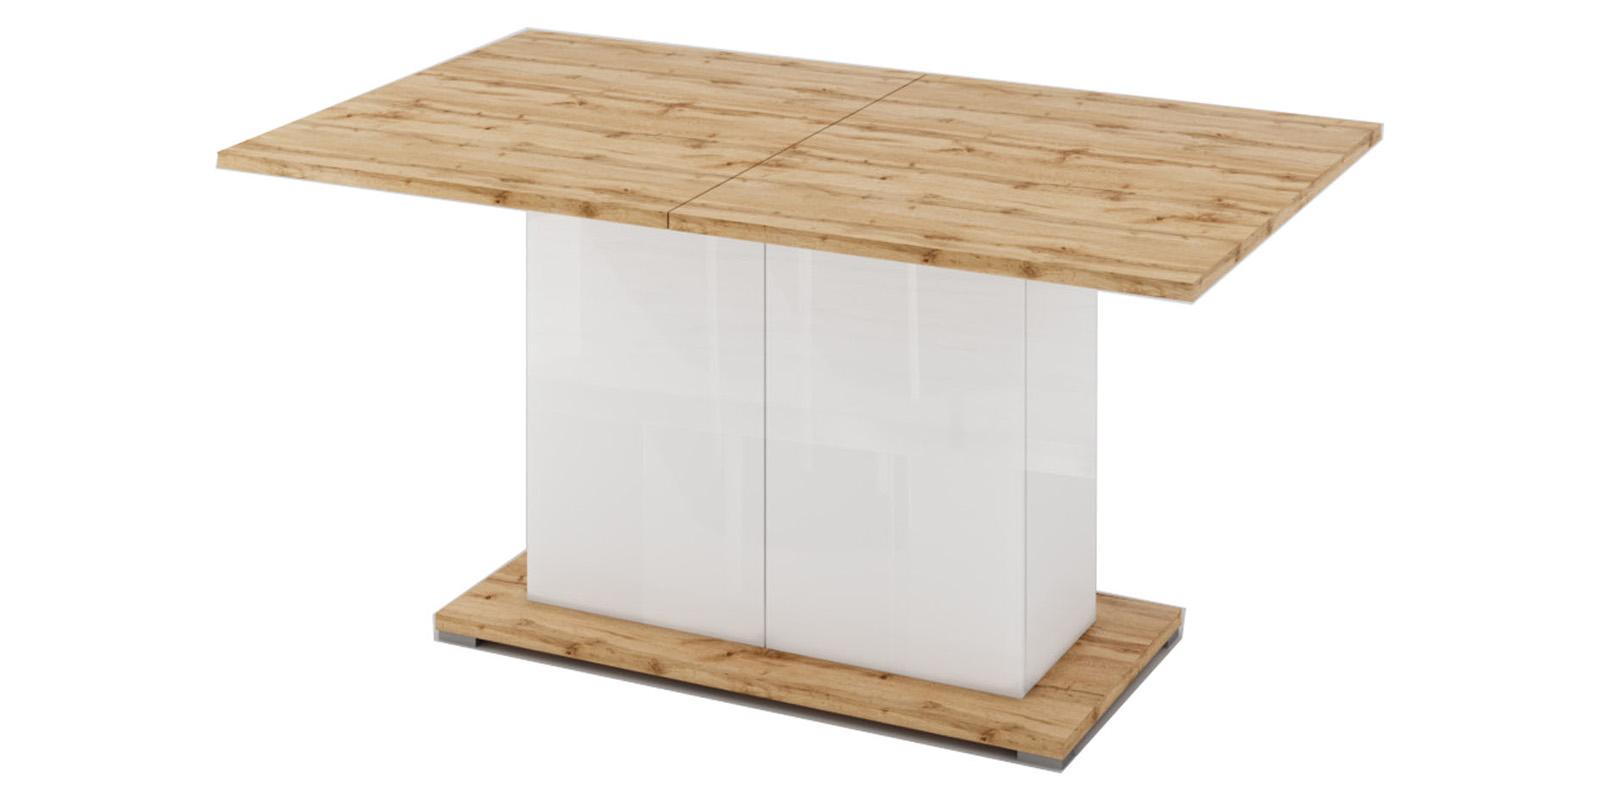 Обеденный стол Сахара Стол обеденный Сахара (дуб ватан/белый лак) САХАРА 1912.М1 фото